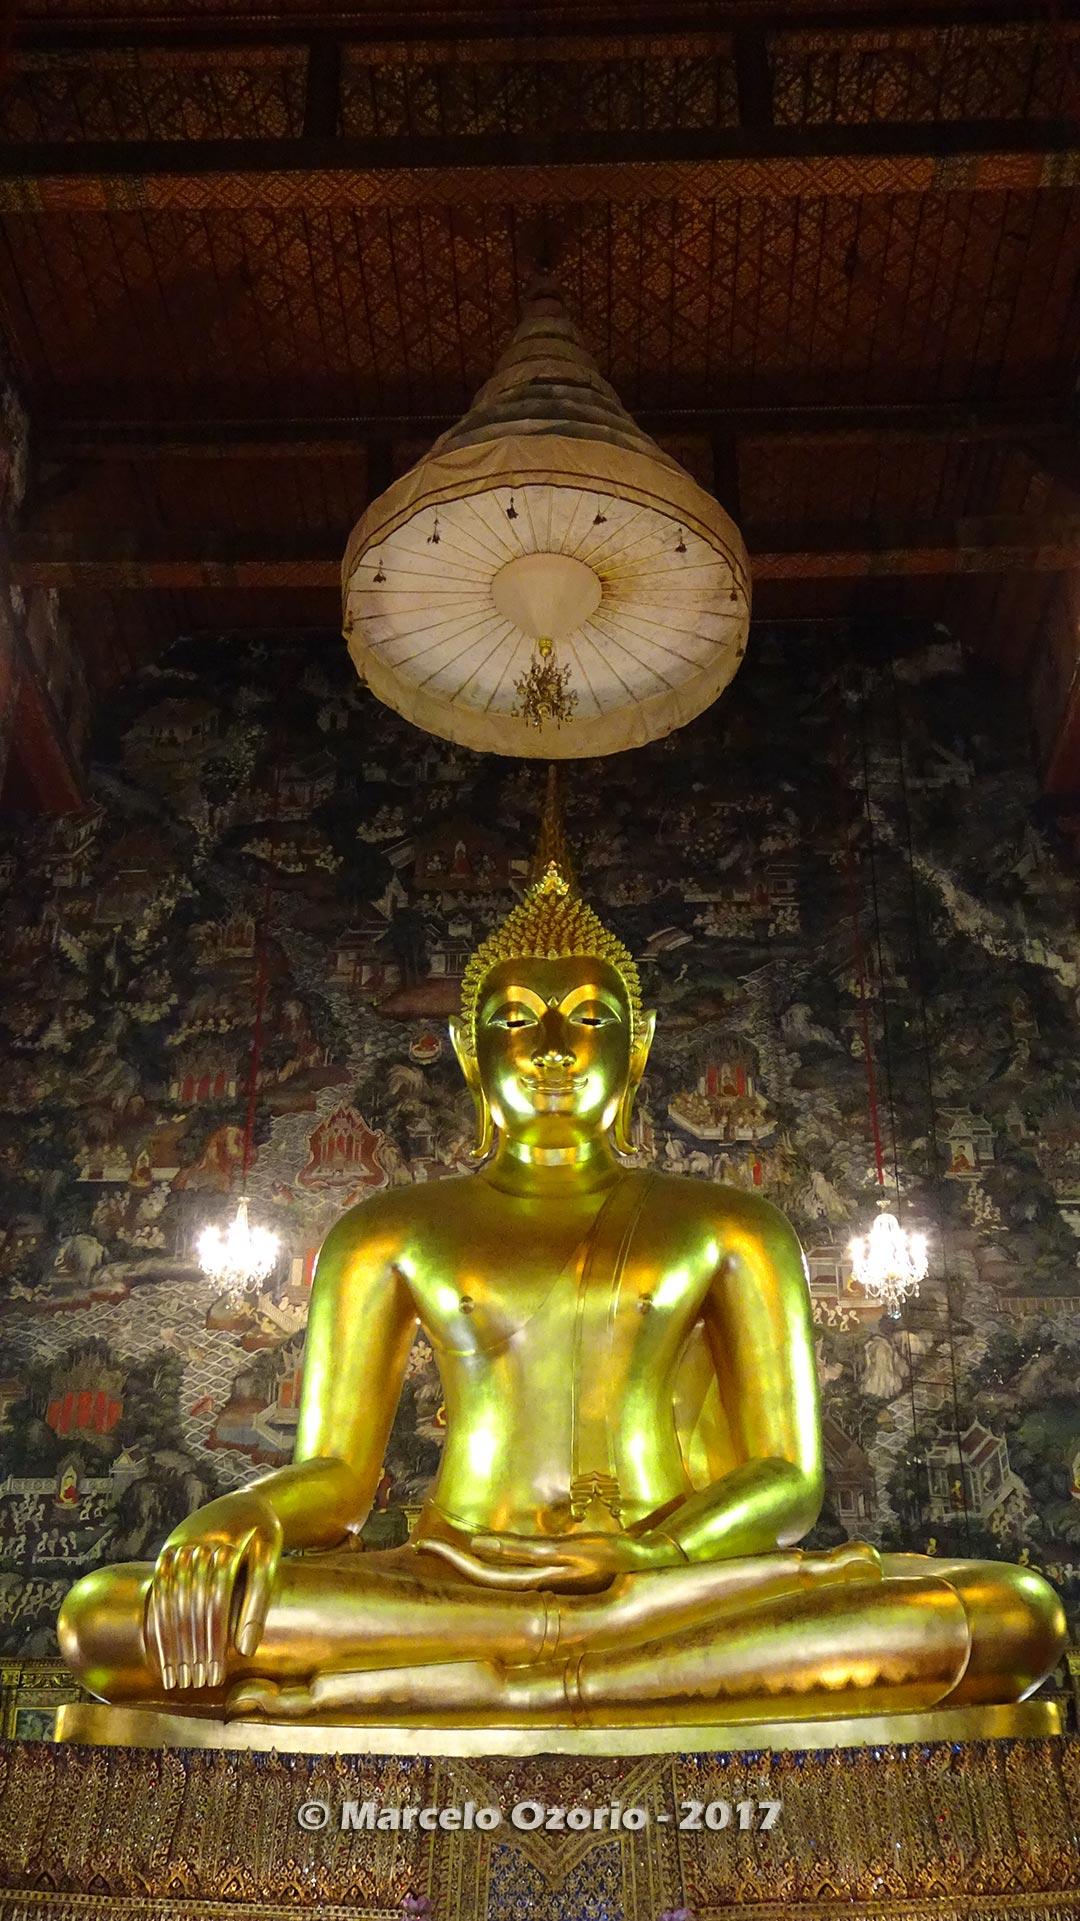 budhas bangkok thailand serie 5 - Buddhas of Bangkok - Thailand